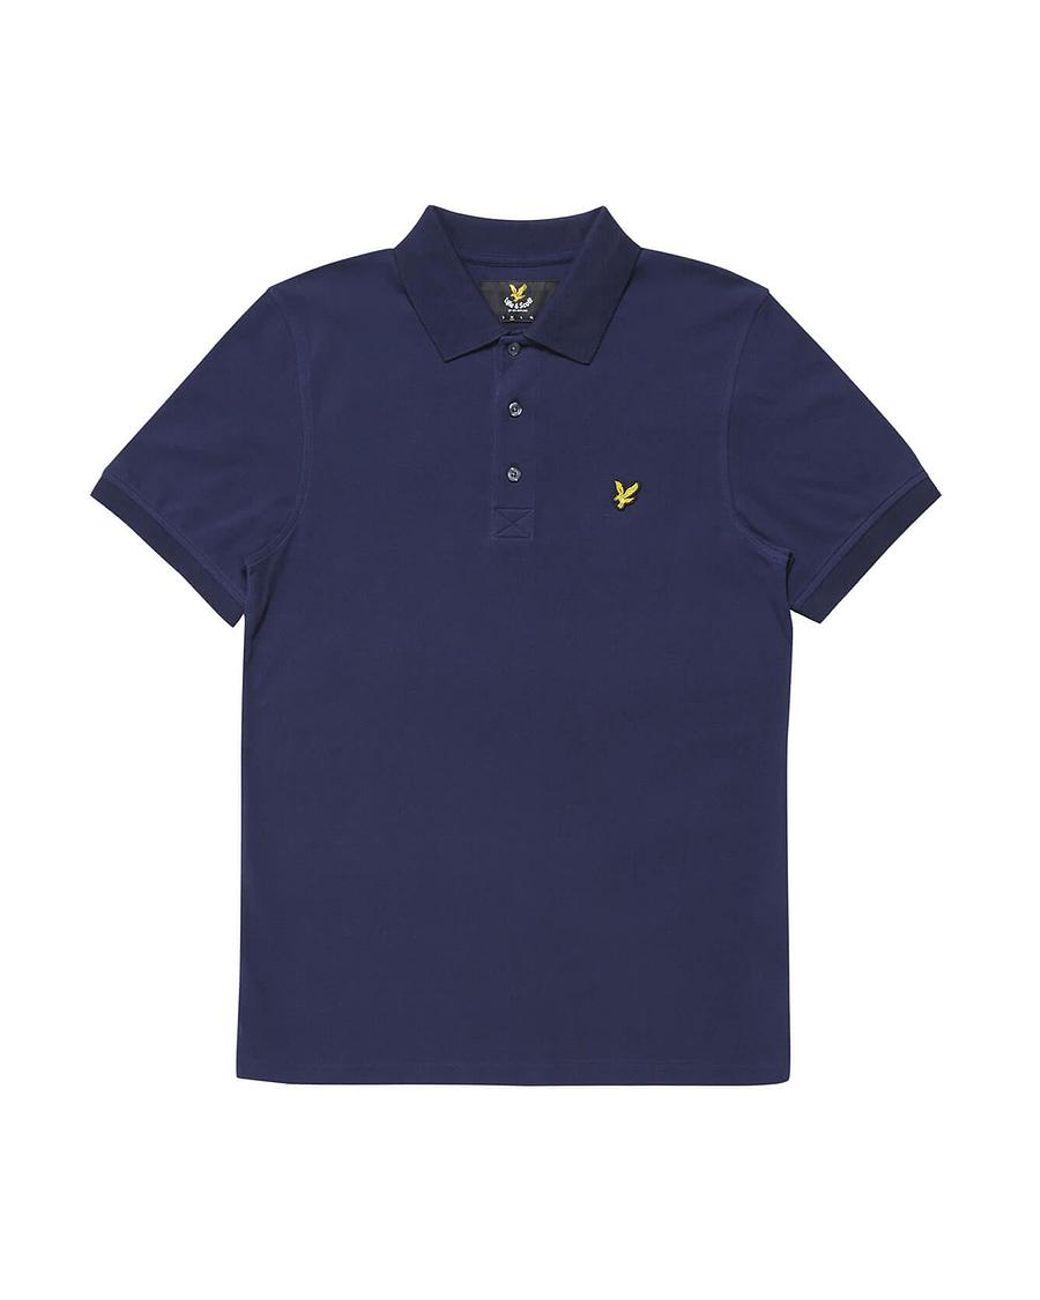 6c0100c5d6b Lyle   Scott Plain Short Sleeve Polo Shirt in Blue for Men - Lyst